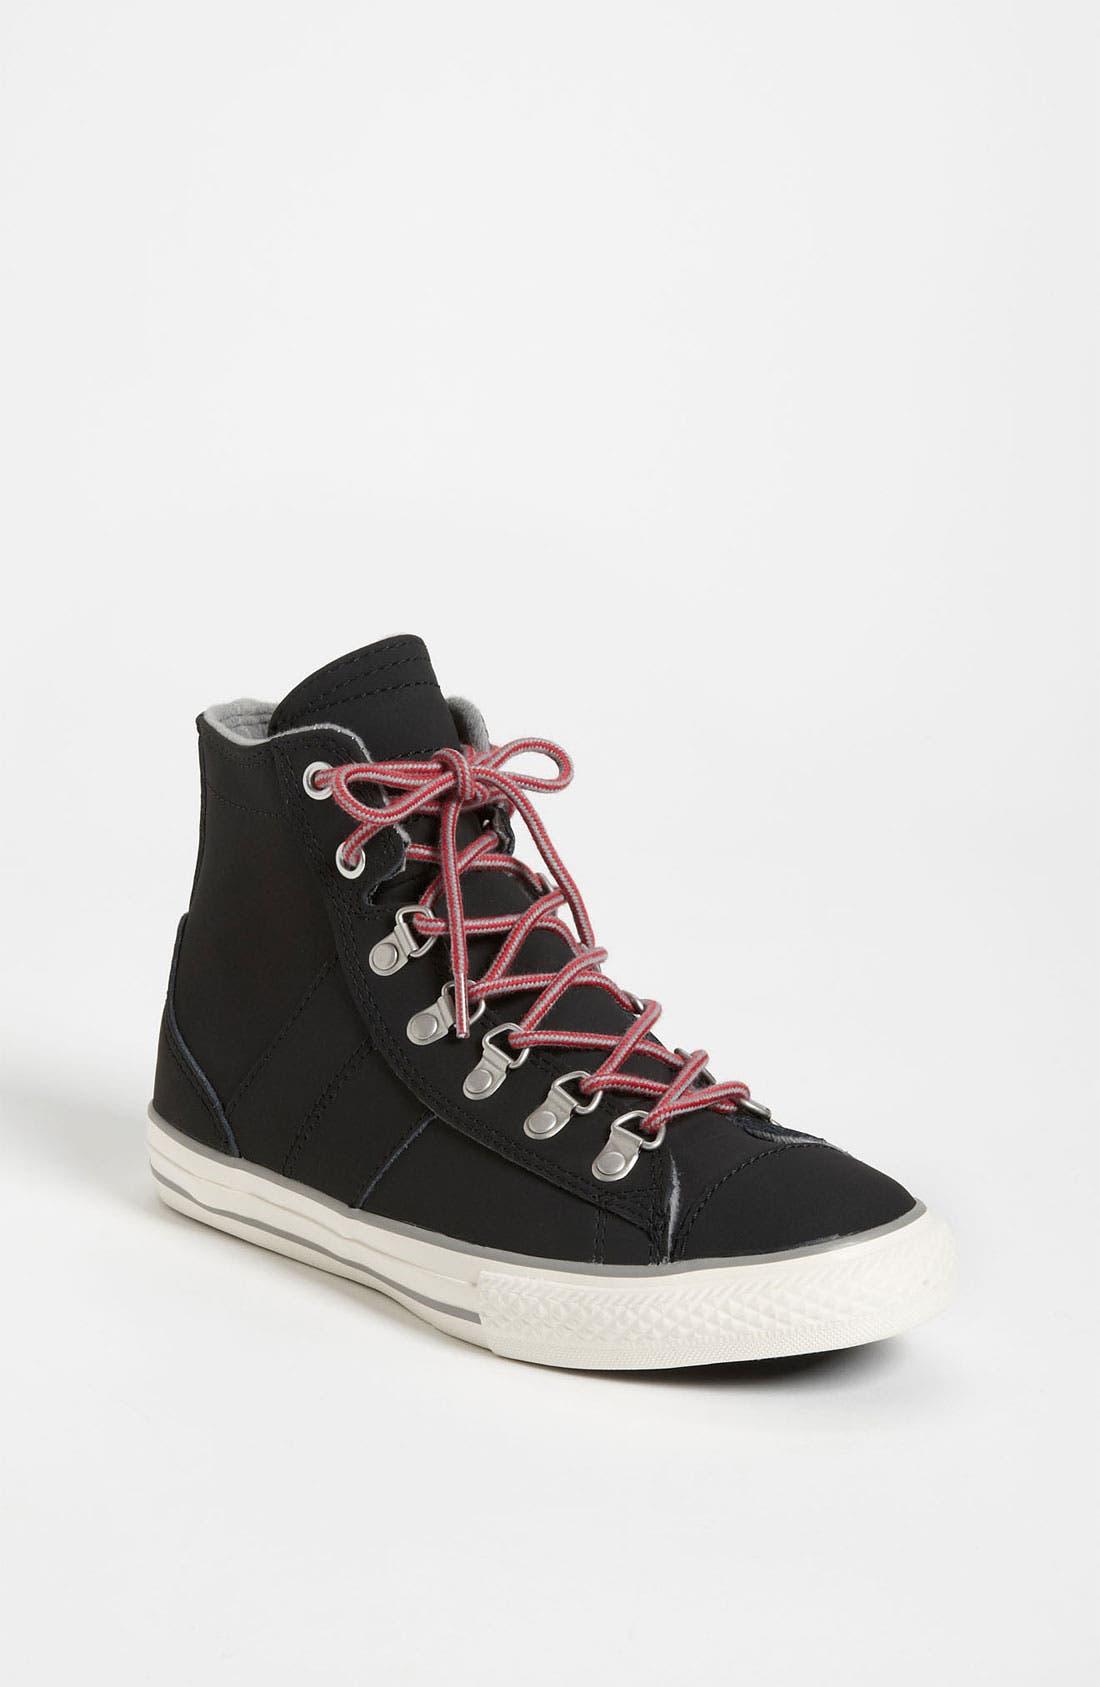 Alternate Image 1 Selected - Converse Chuck Taylor® 'Sneaker Boot' Sneaker (Toddler, Little Kid & Big Kid)